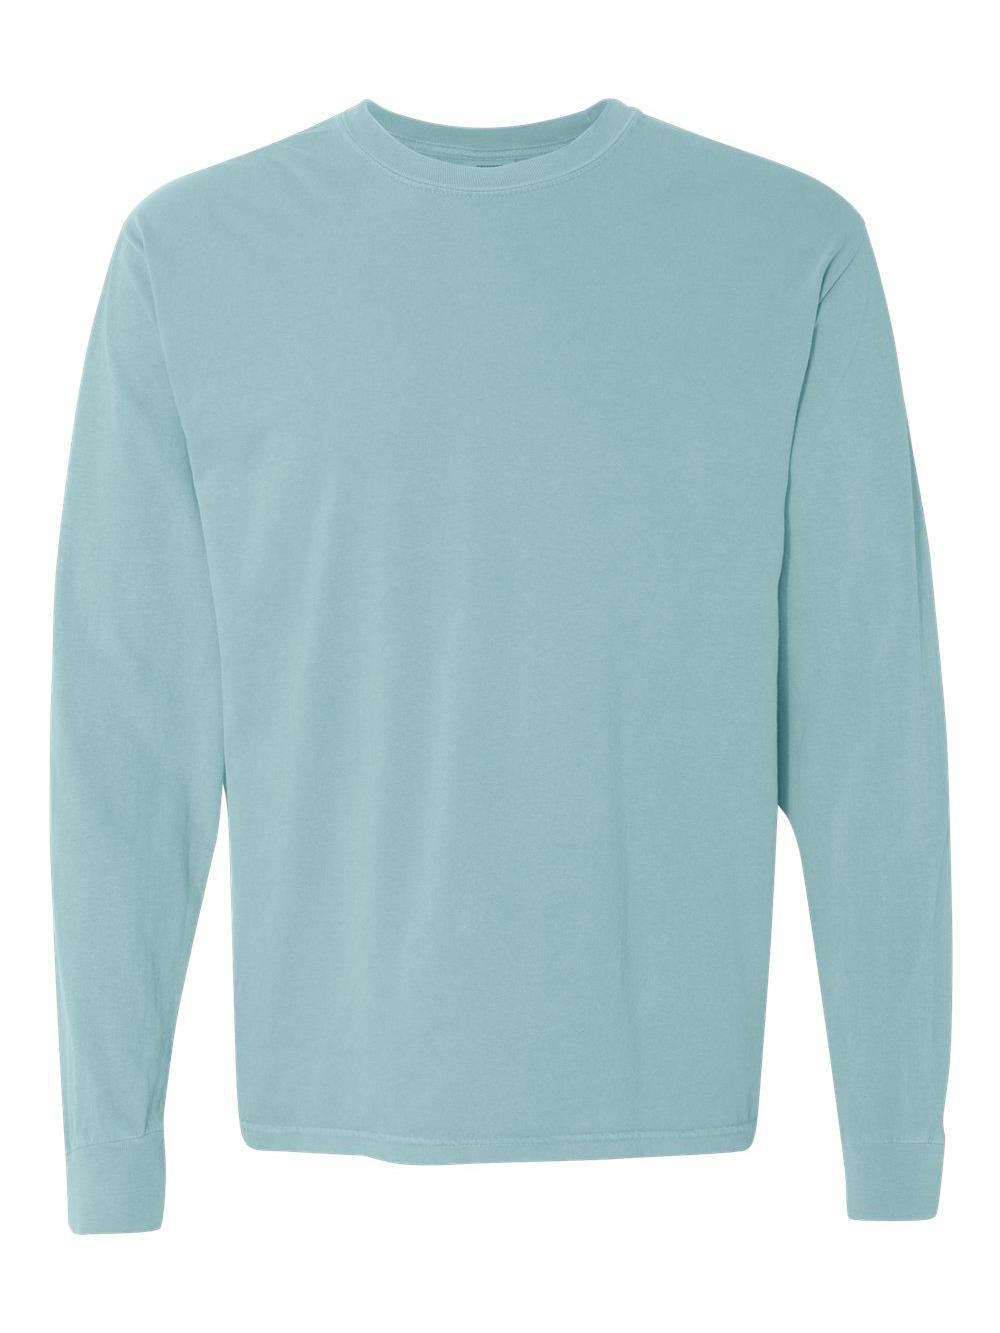 Comfort-Colors-Garment-Dyed-Heavyweight-Ringspun-Long-Sleeve-T-Shirt-6014 thumbnail 24